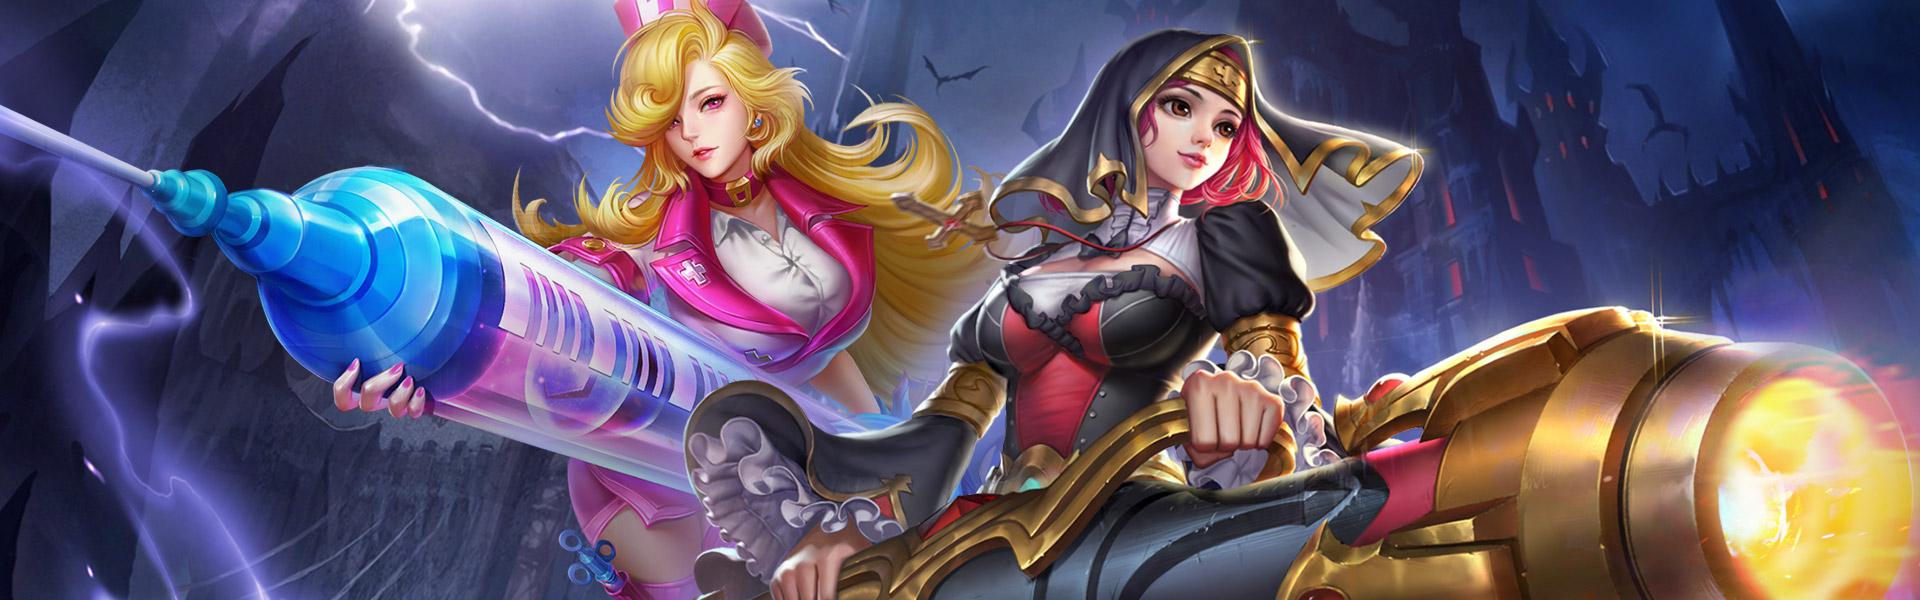 Heroes Evolved Update - April 24 2019